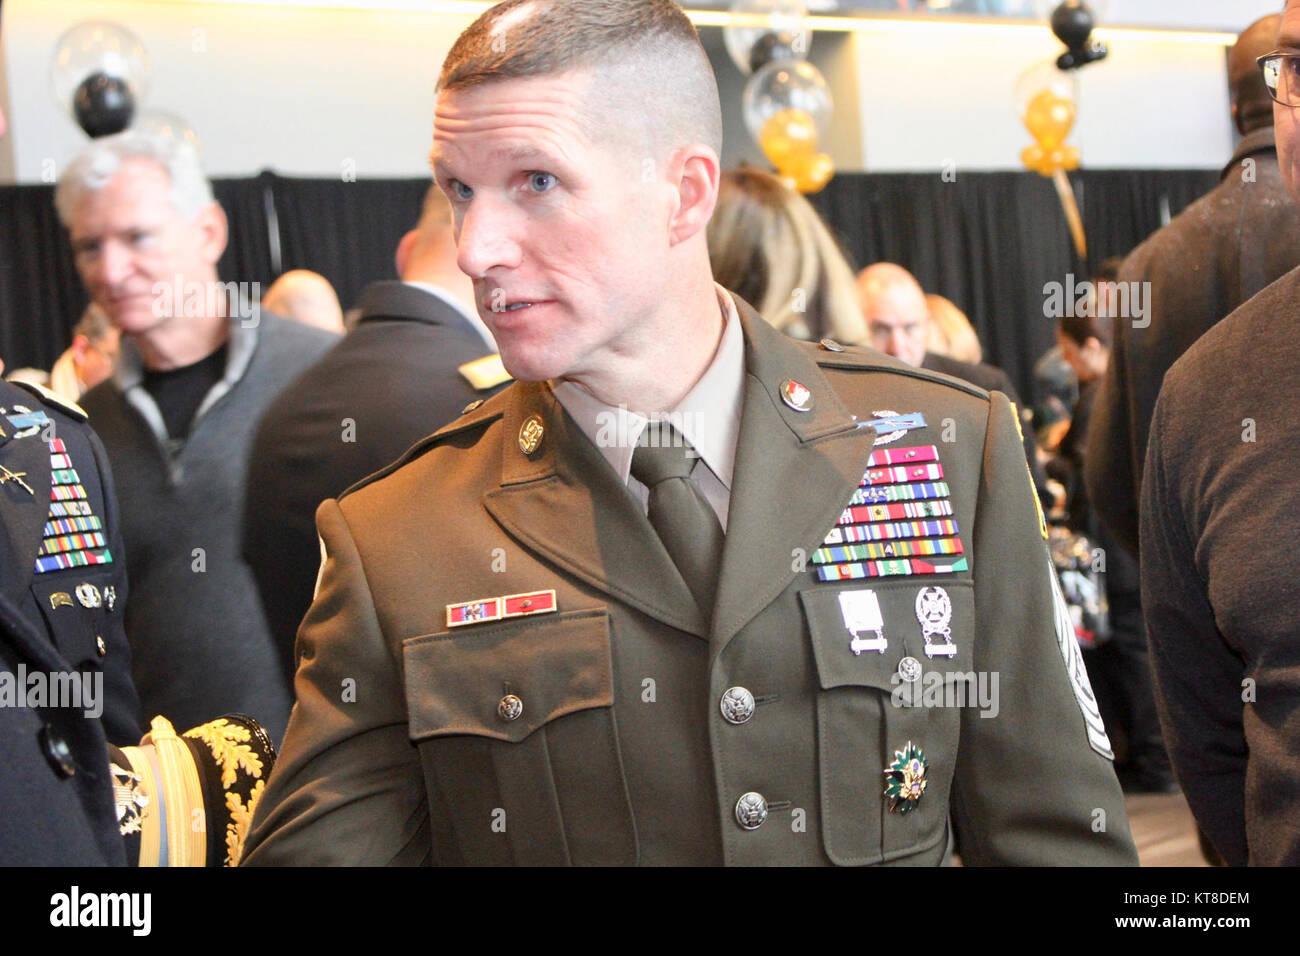 Army Navy Game 2017 Philadelphia >> Sergeant Major Of The Army Dailey Stock Photos & Sergeant Major Of The Army Dailey Stock Images ...